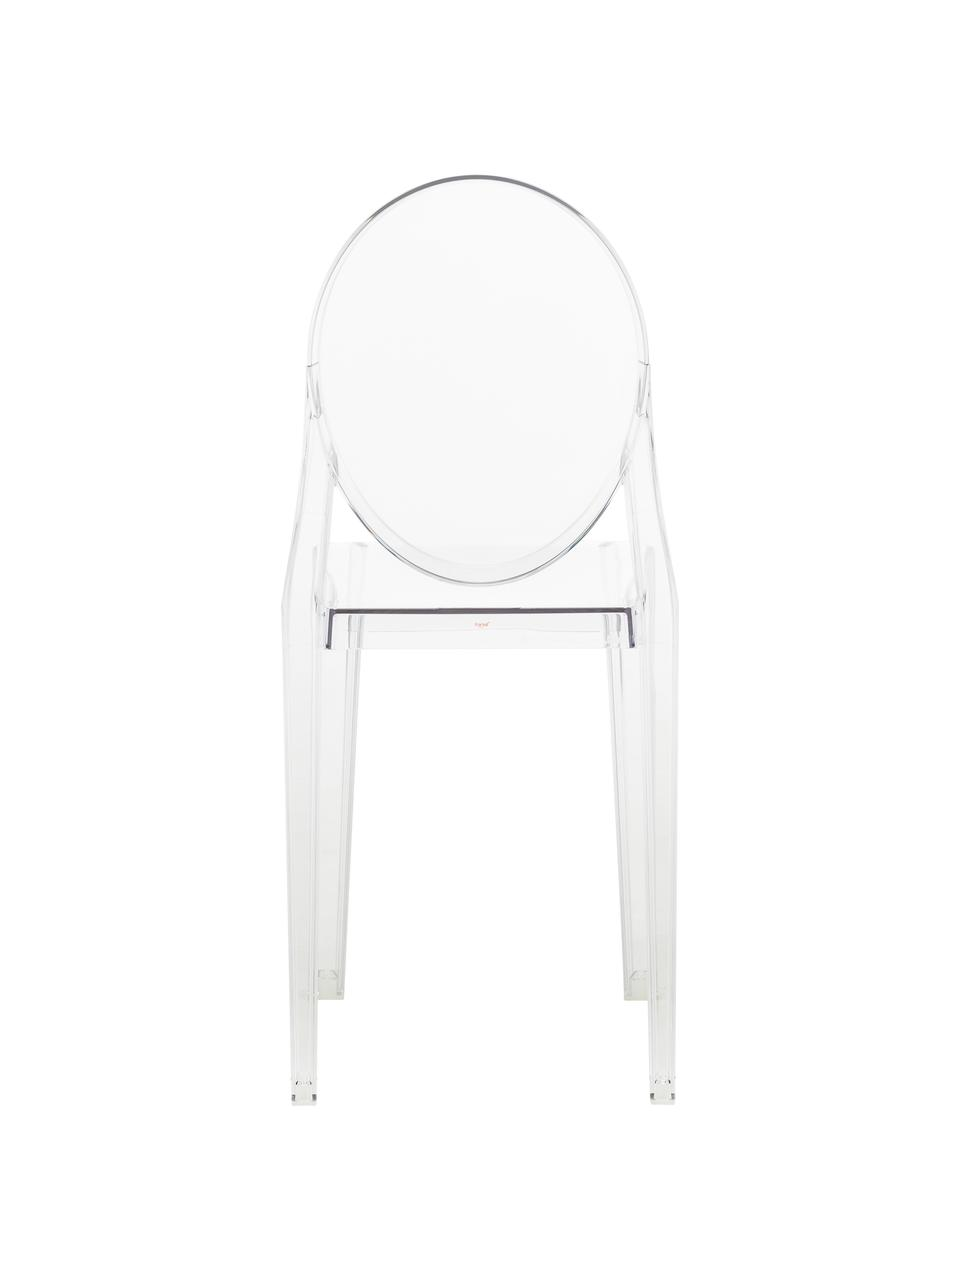 Transparante stoel Ghost, Polycarbonaat, Transparant, 38 x 89 cm